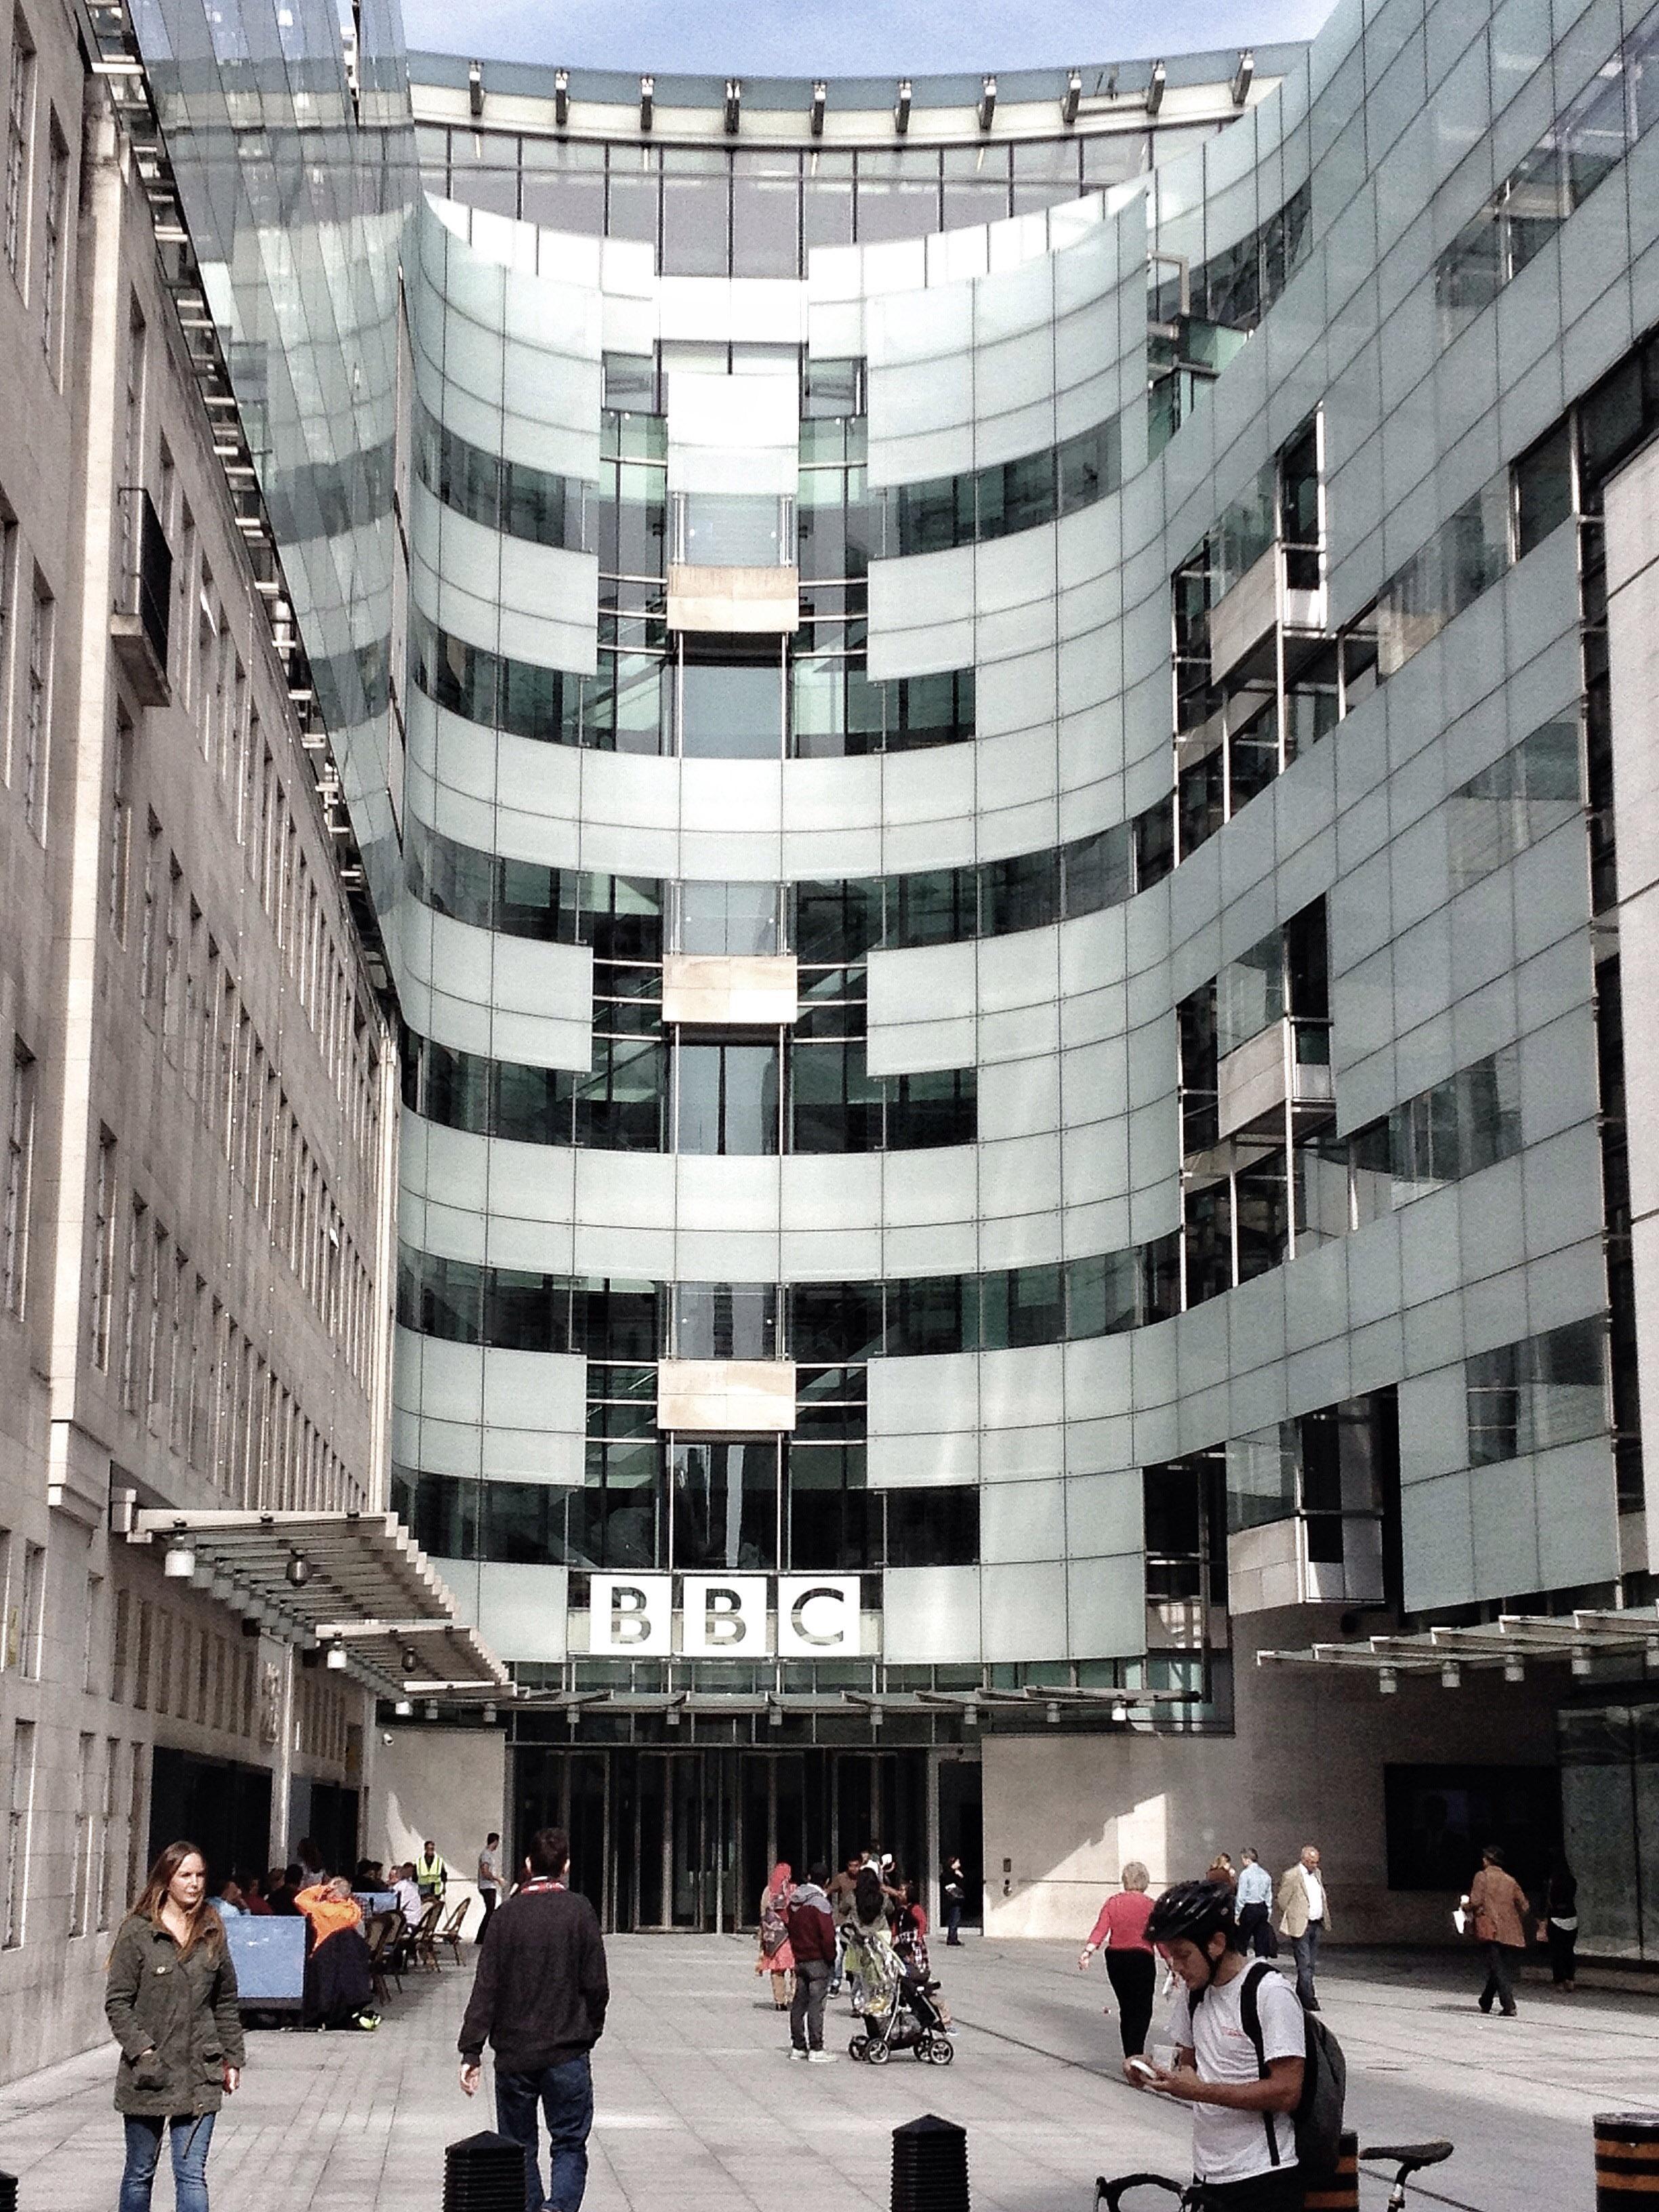 kathrine_bbc_building